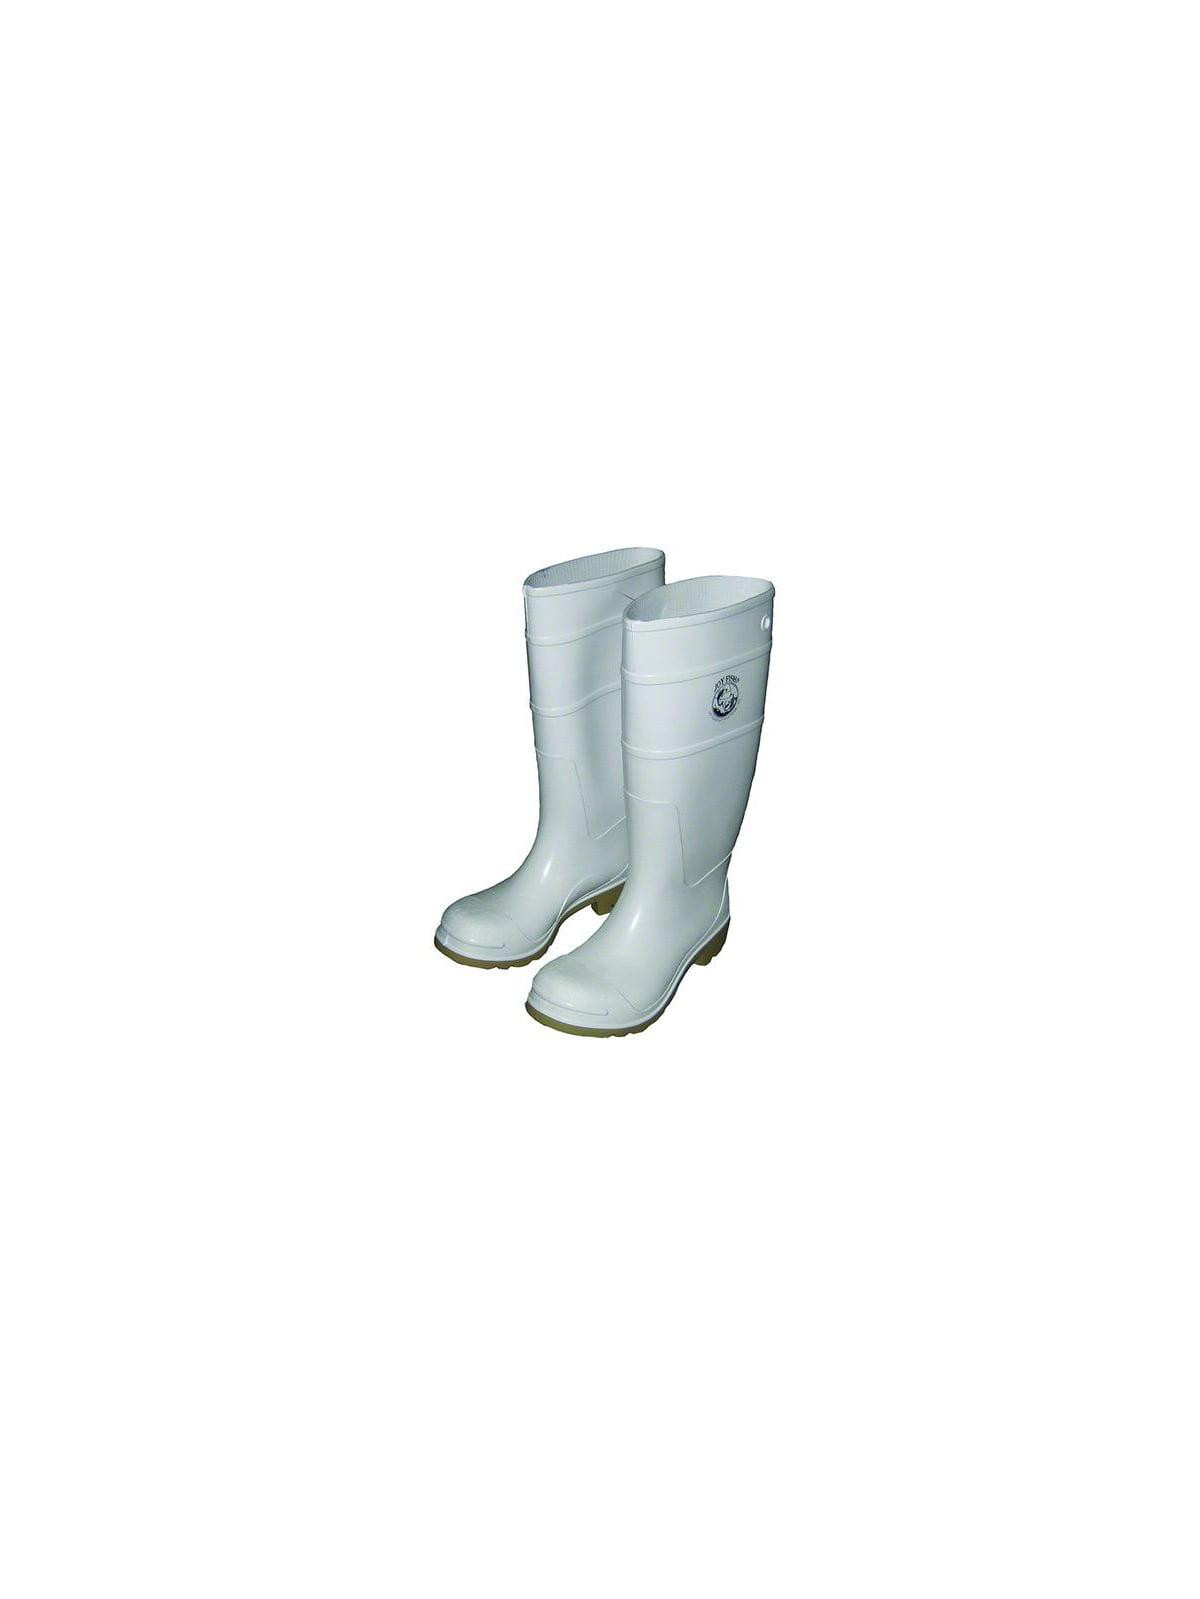 "Joy Fish BOOT10-JOYFISH-W White PVC 16"" Boot Men's Sz10, BOOT-10-JOYFISH-W"